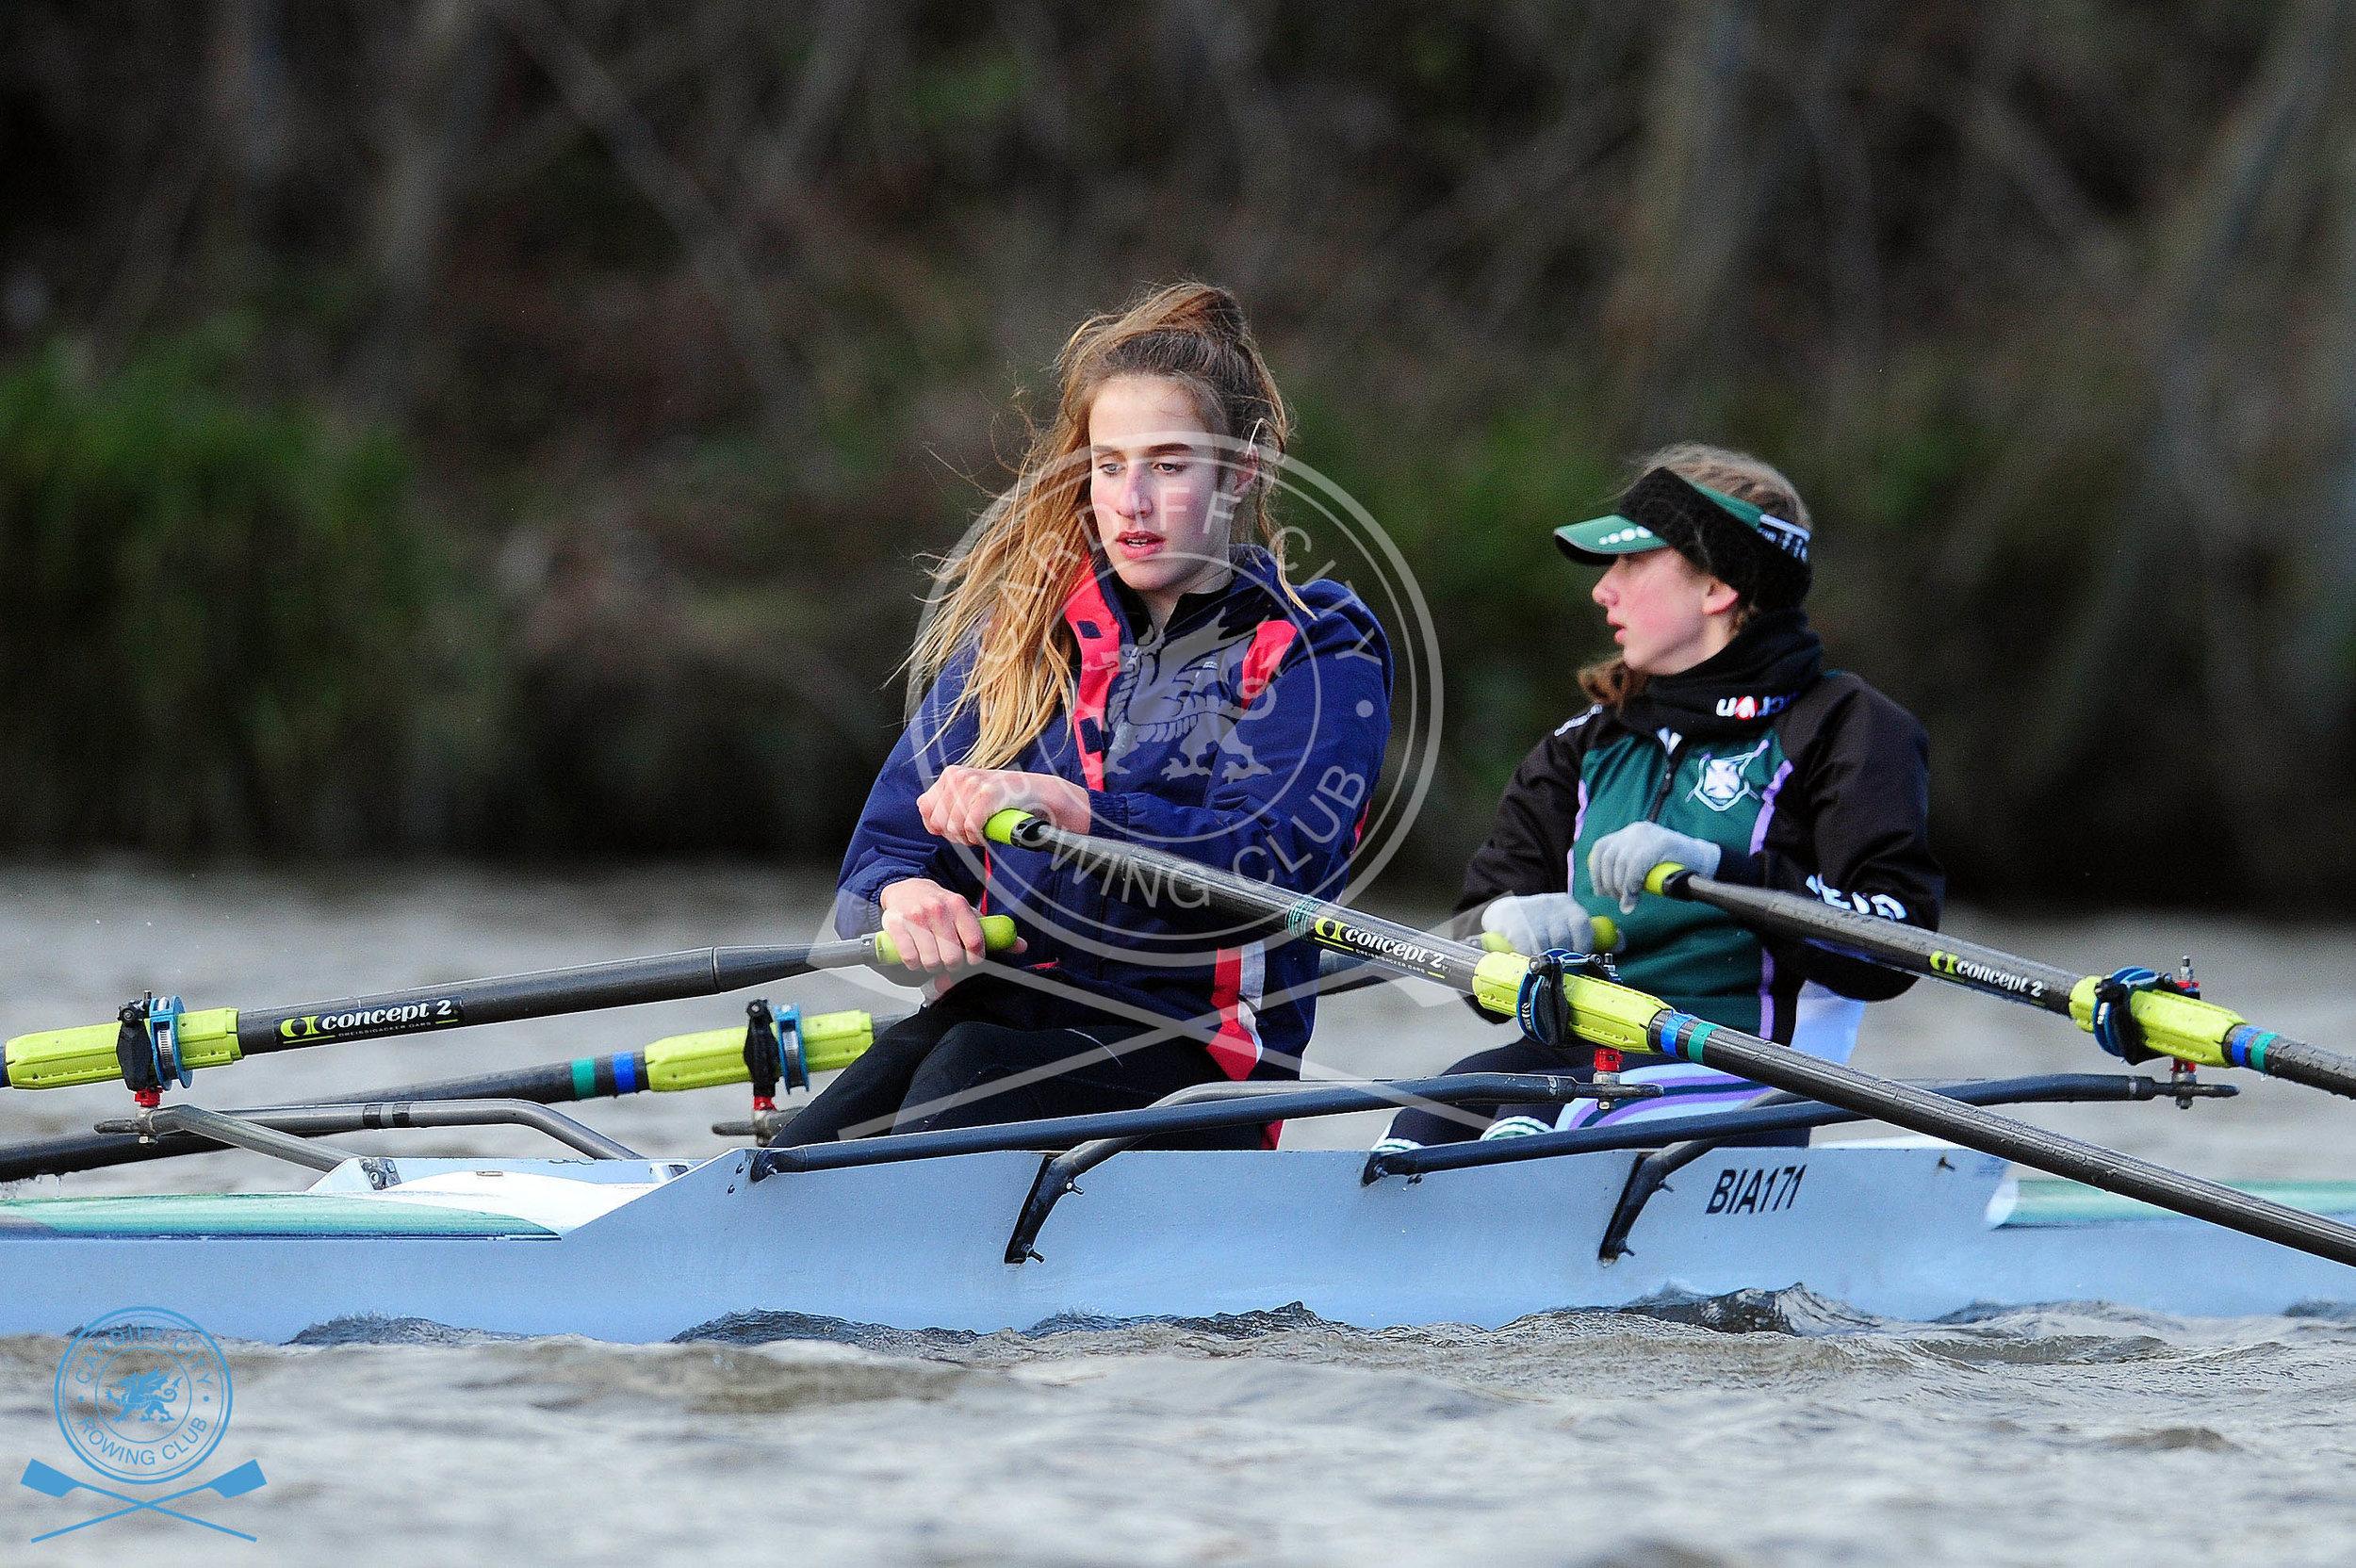 DW_280119_Cardiff_City_Rowing_218.jpg